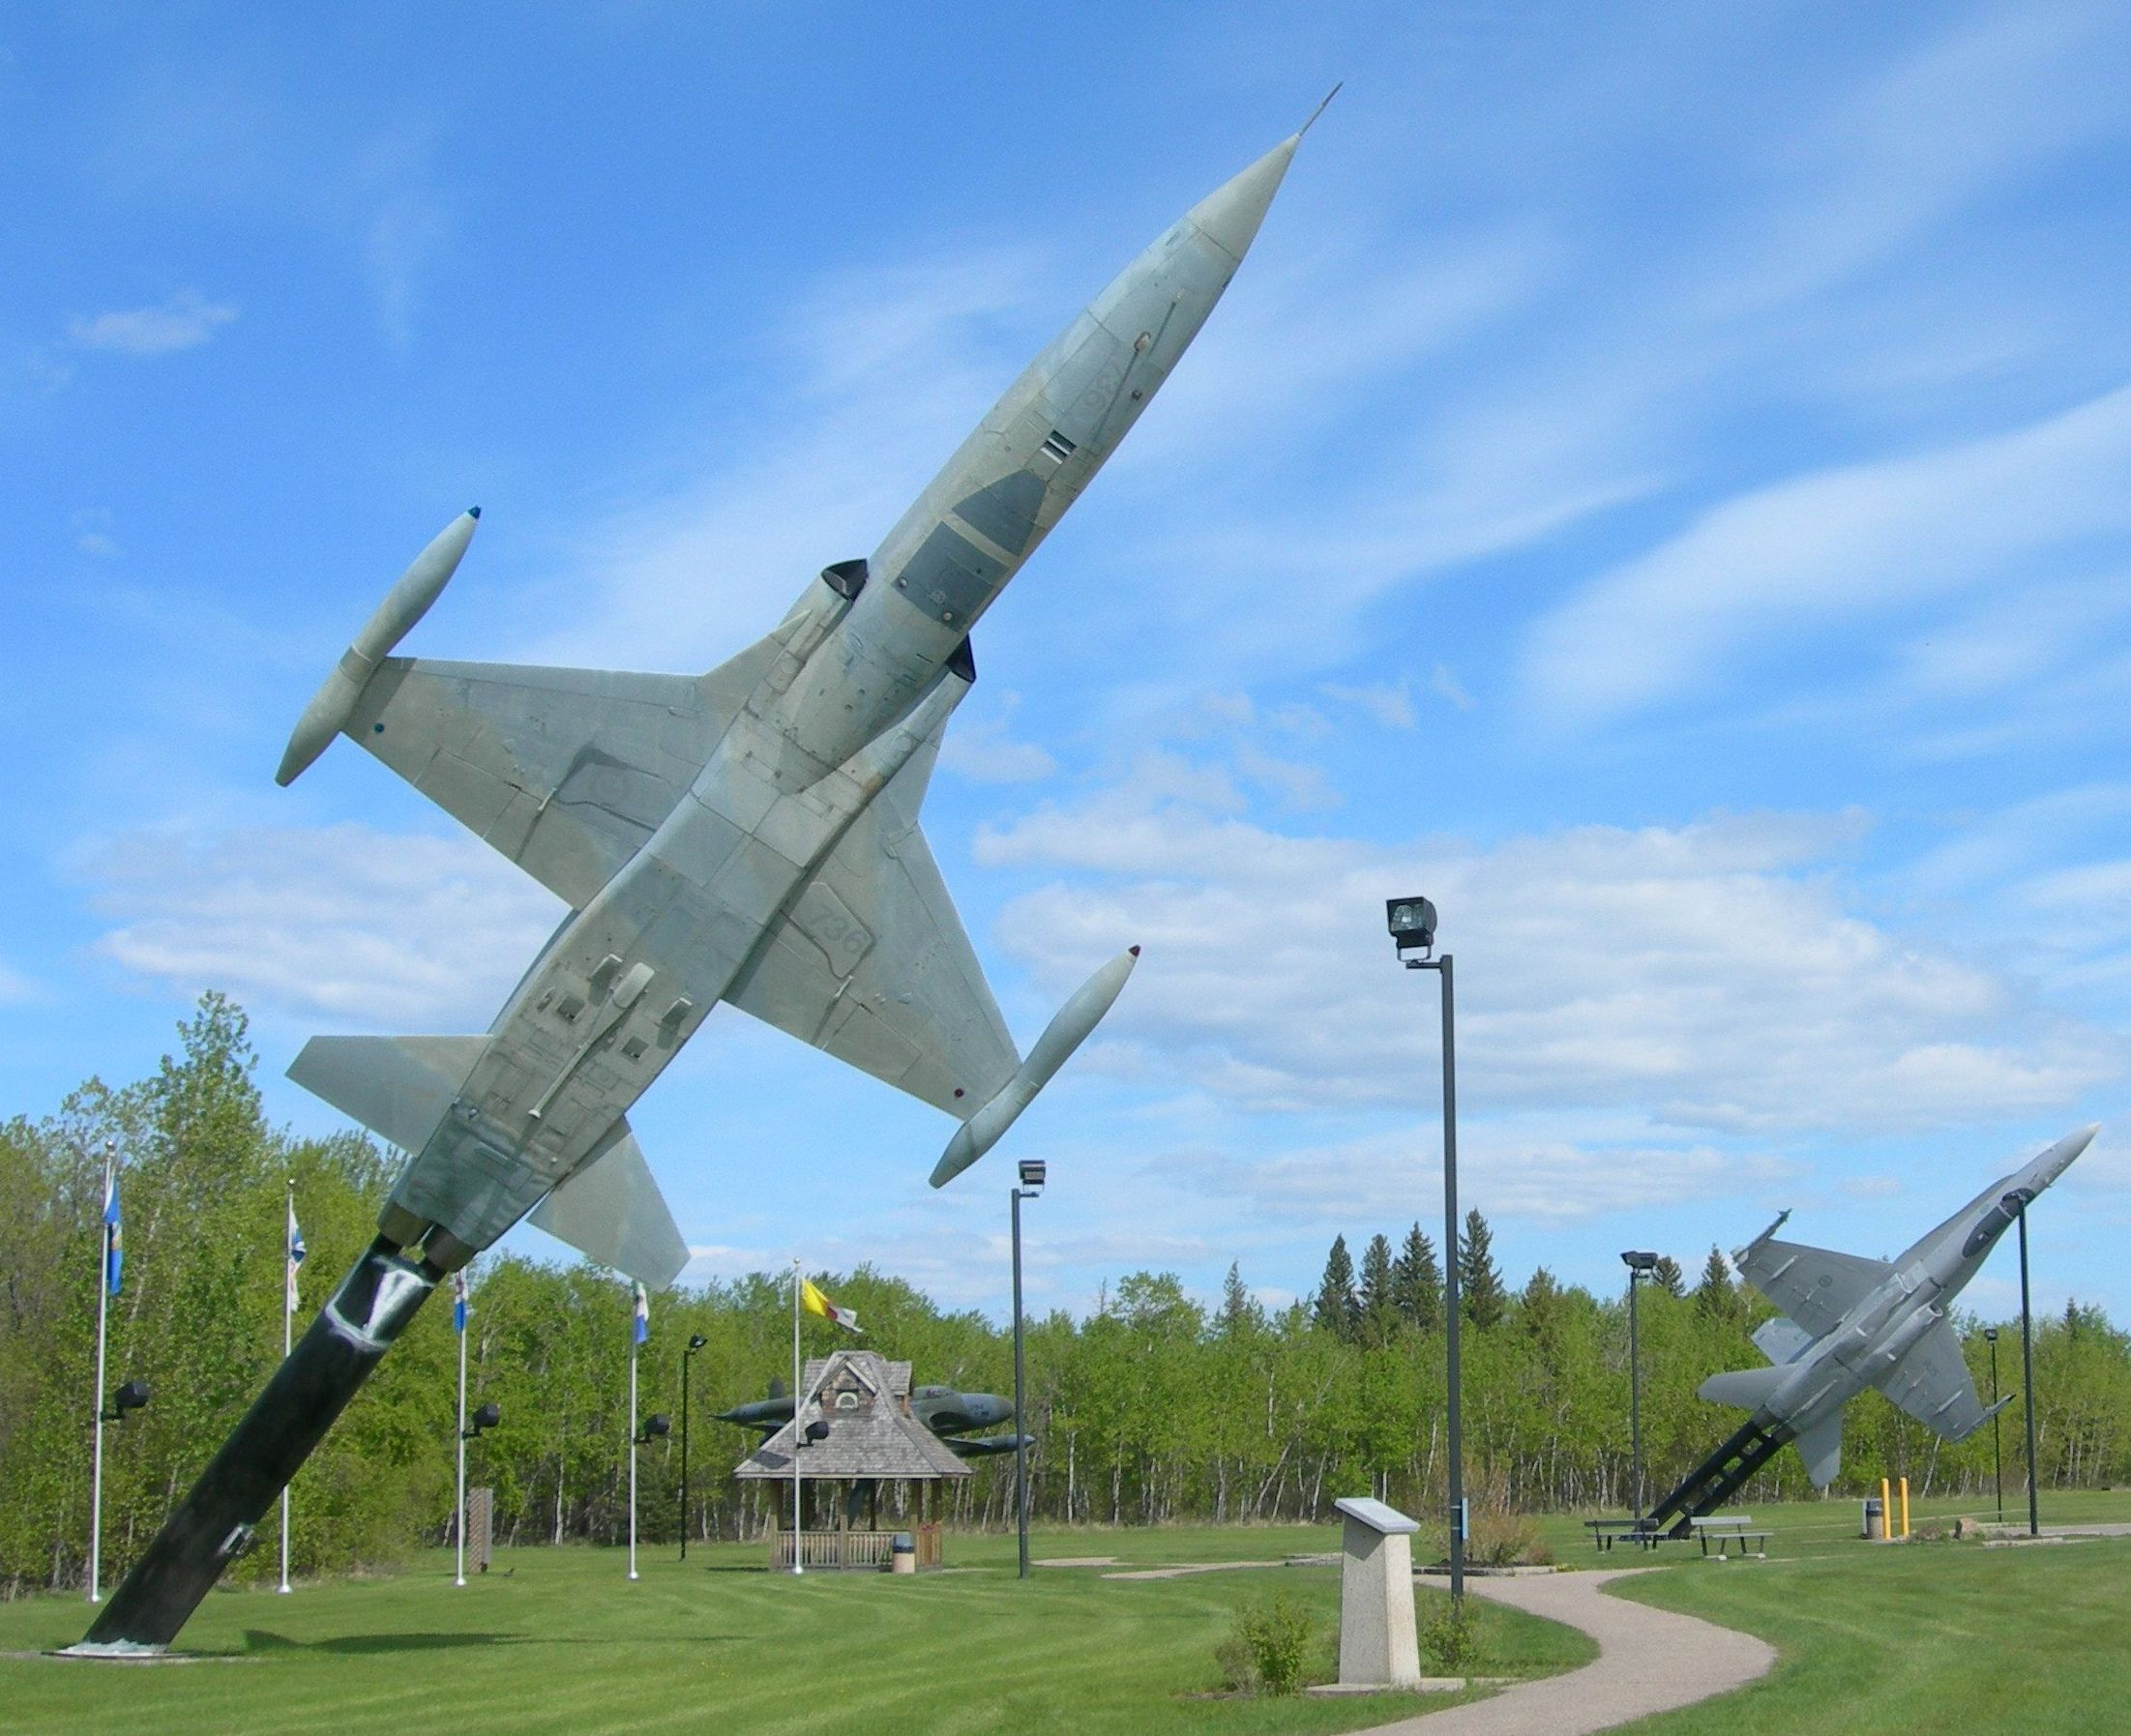 Stèles Base aérienne Cold Lake-Alberta-Canada 14060504282217629412292936